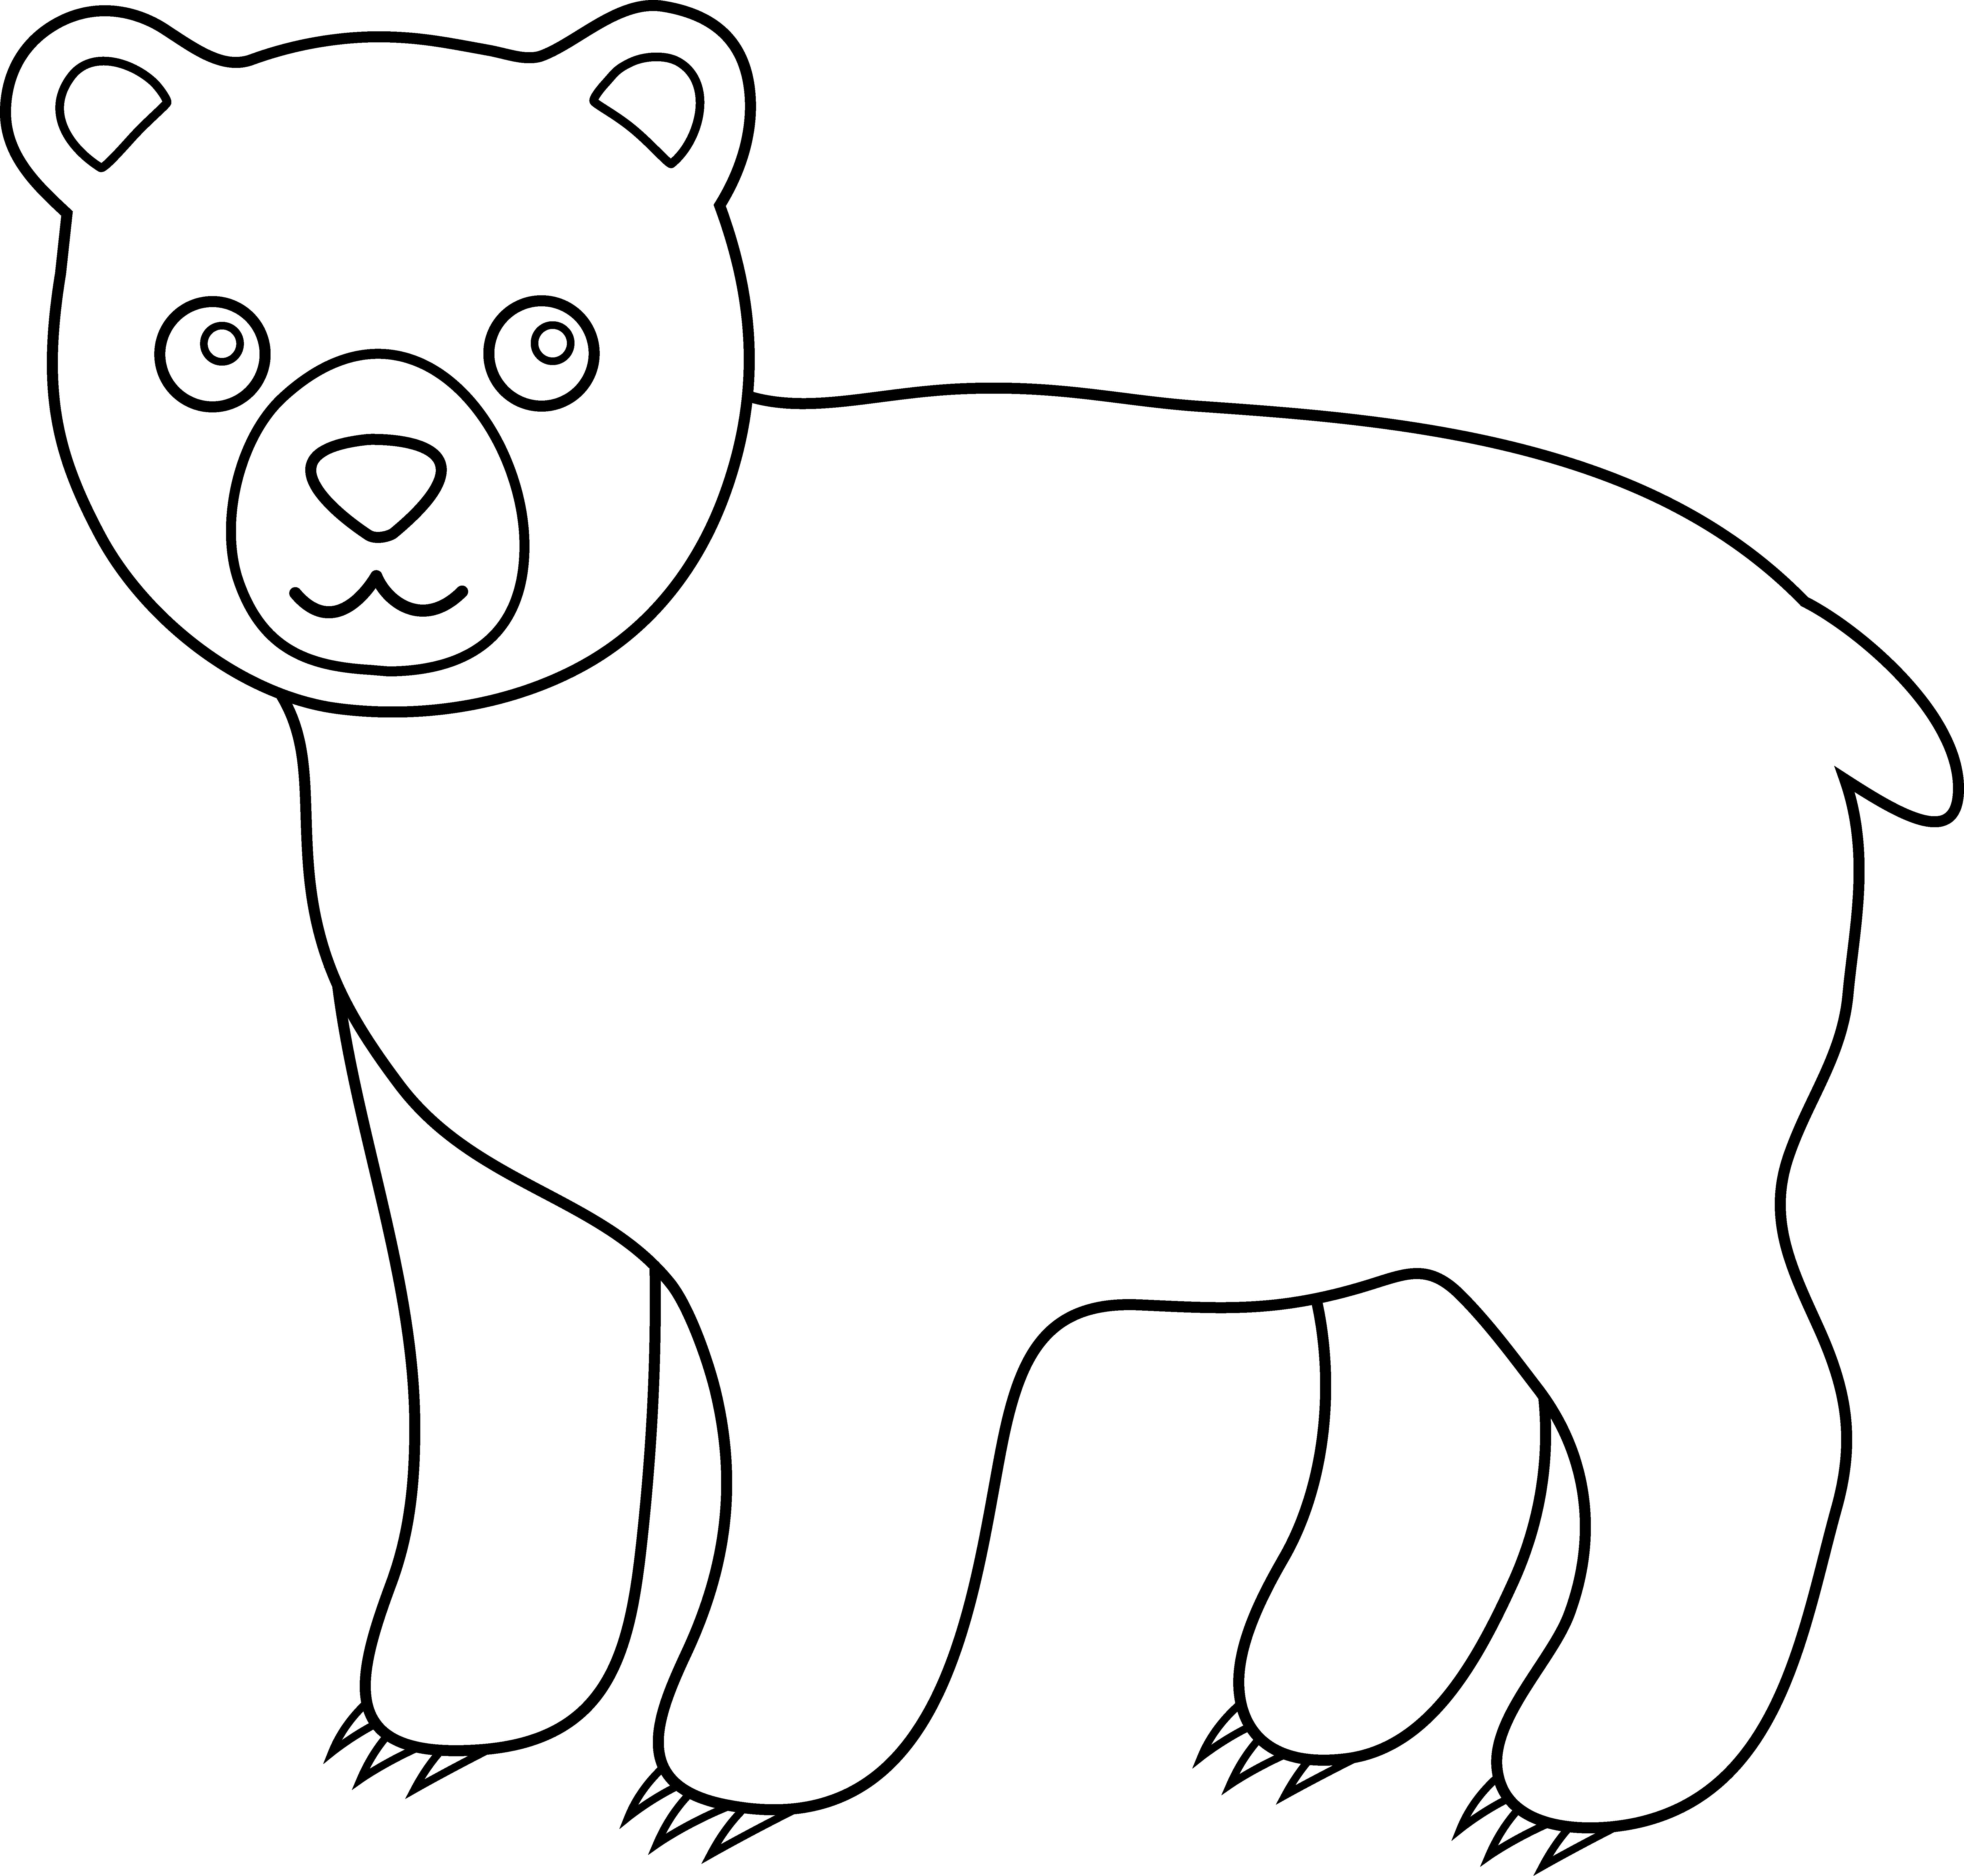 Line Art Animals : Line art animals cliparts